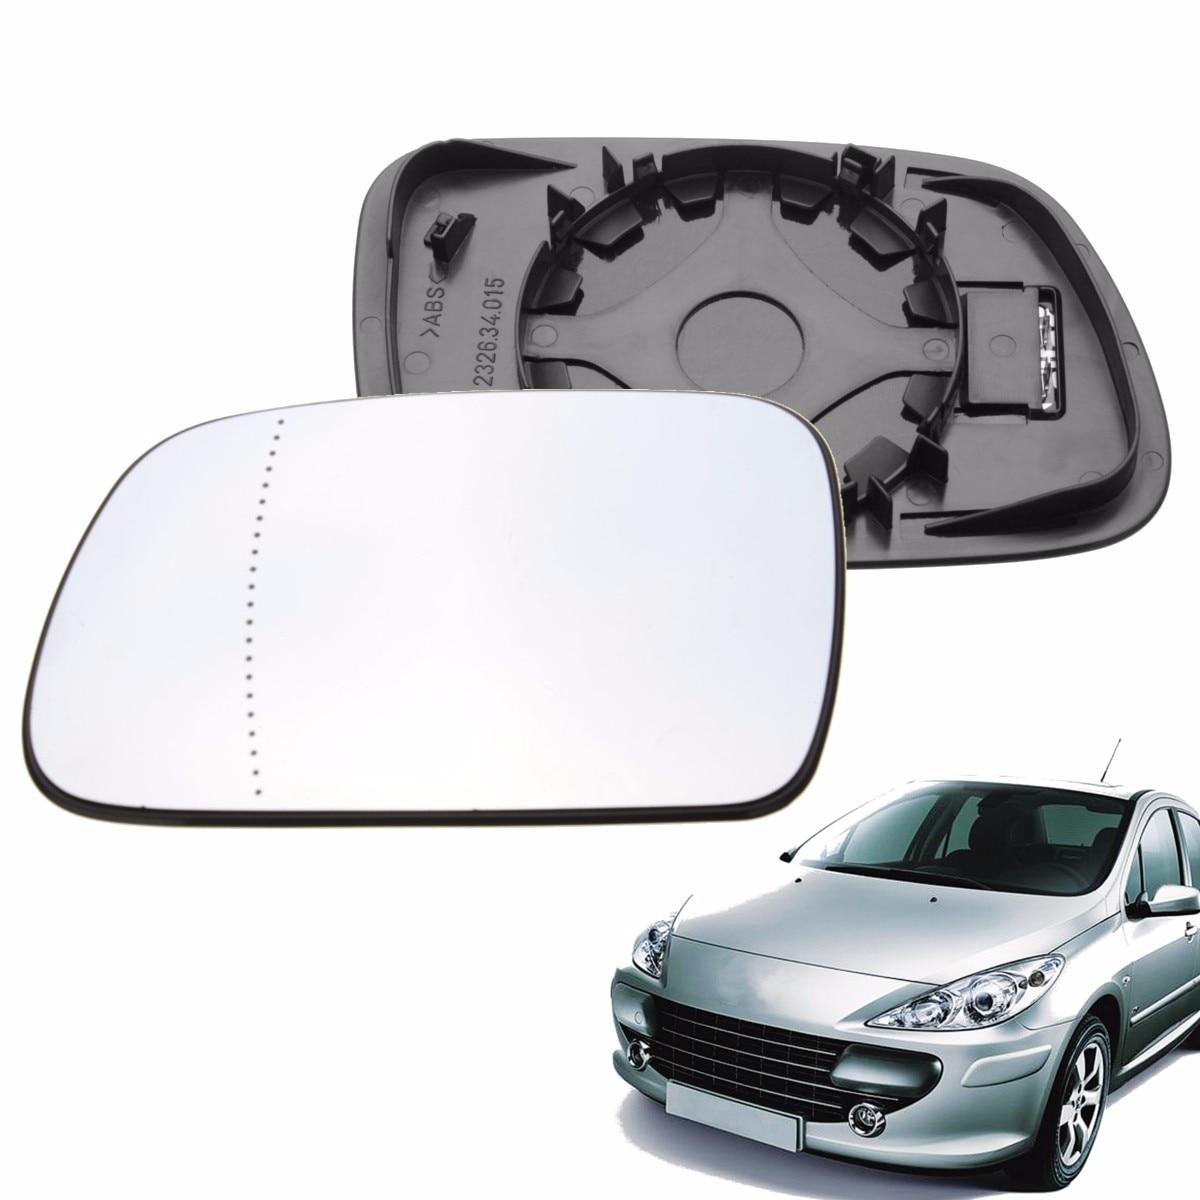 Ala izquierda del lado del pasajero de Vidrio Espejo Para Toyota C-hr 2016-On climatizada